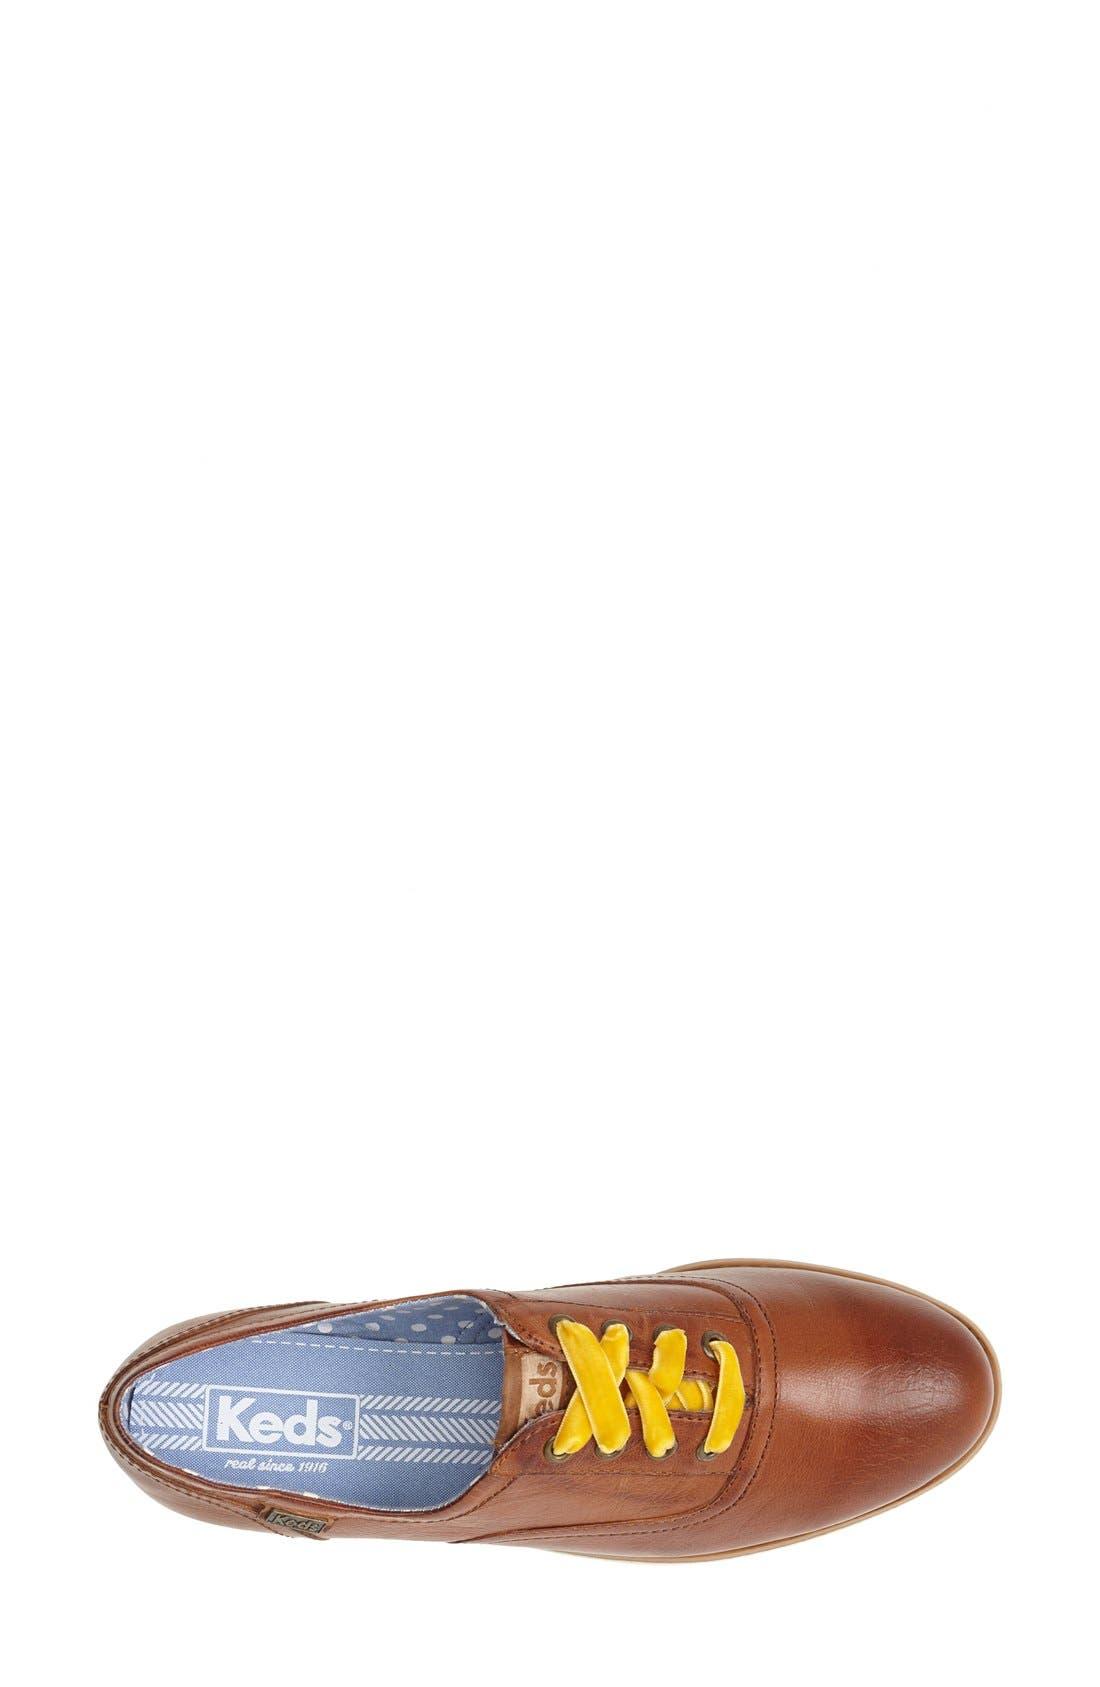 Alternate Image 3  - Keds® 'Boyfriend' Leather Oxford (Women)